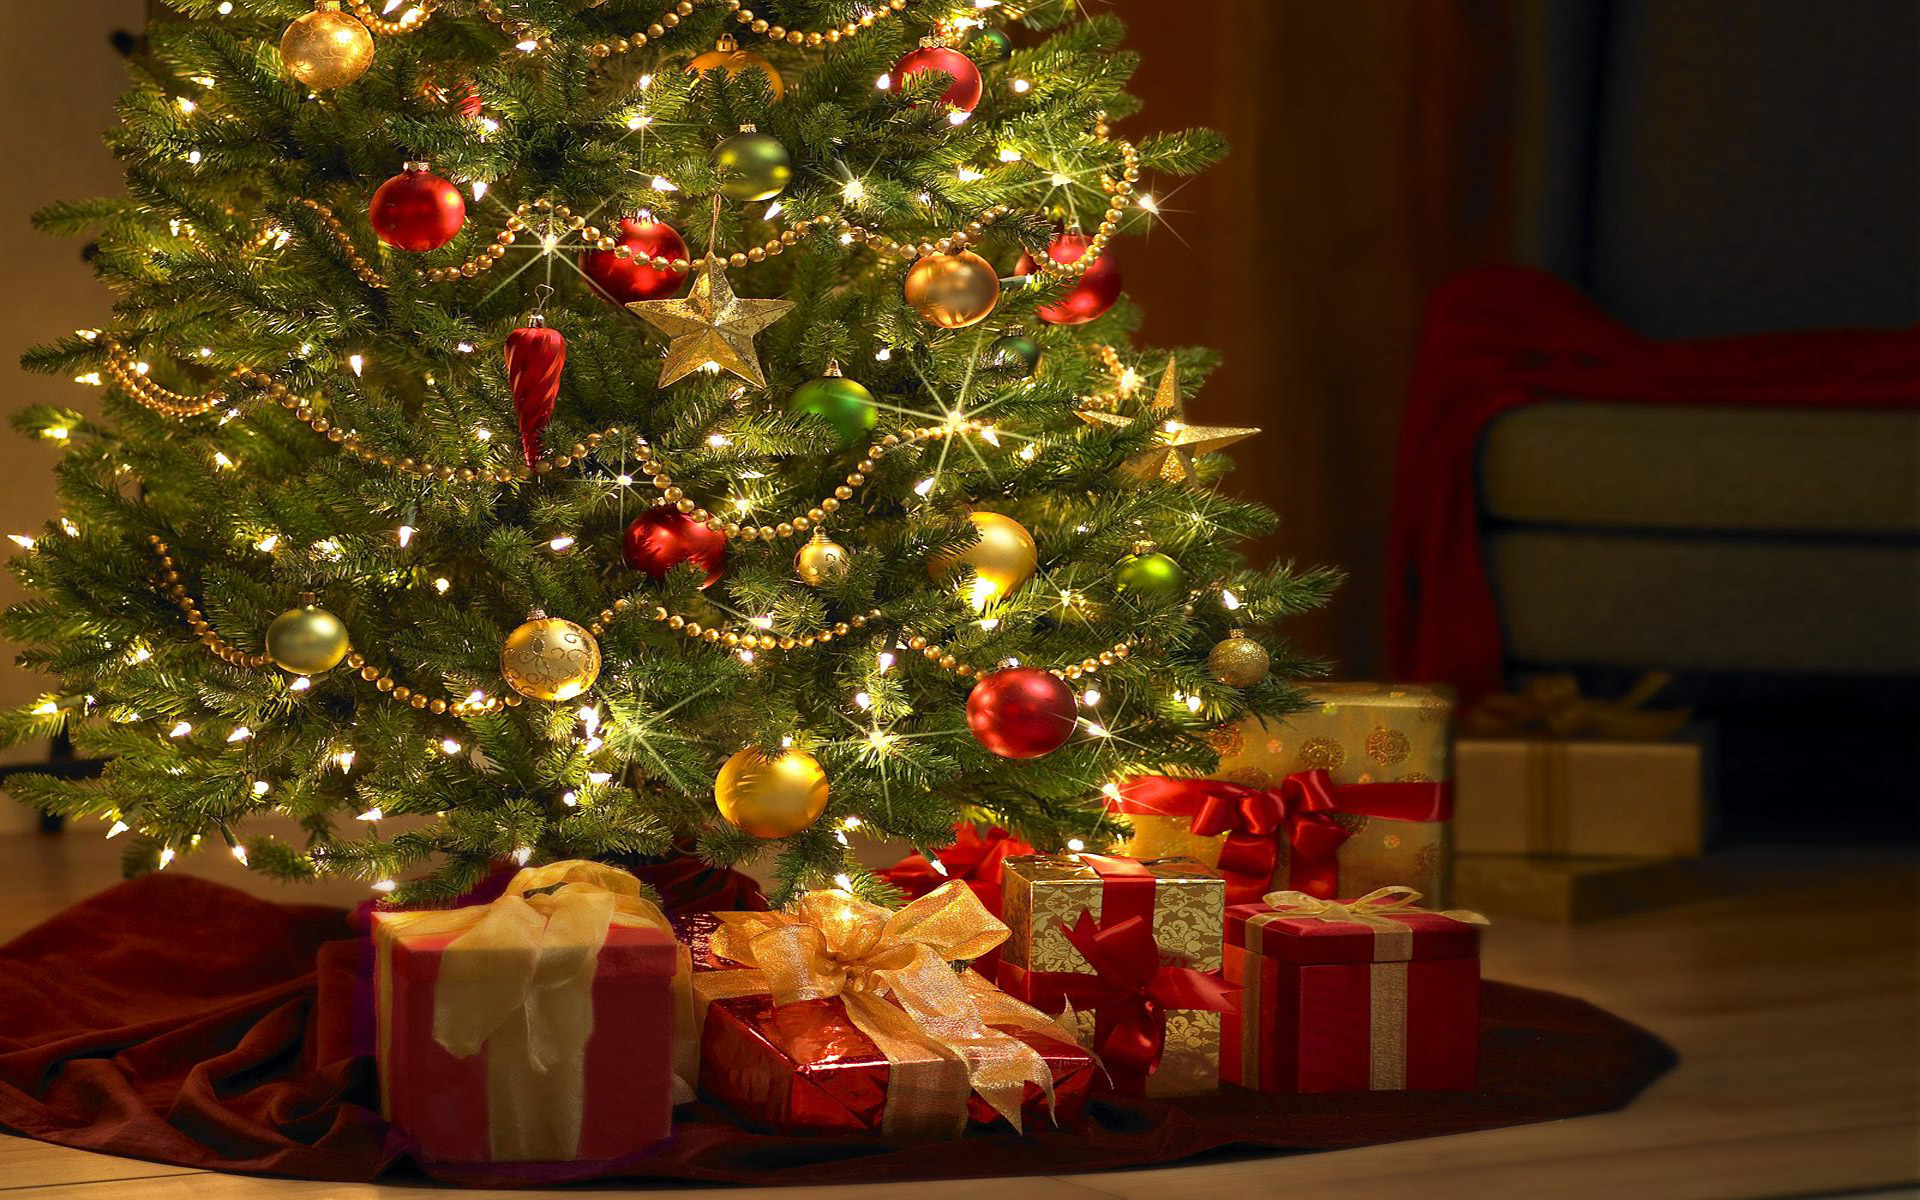 78+] Christmas Tree Wallpaper Free on ...